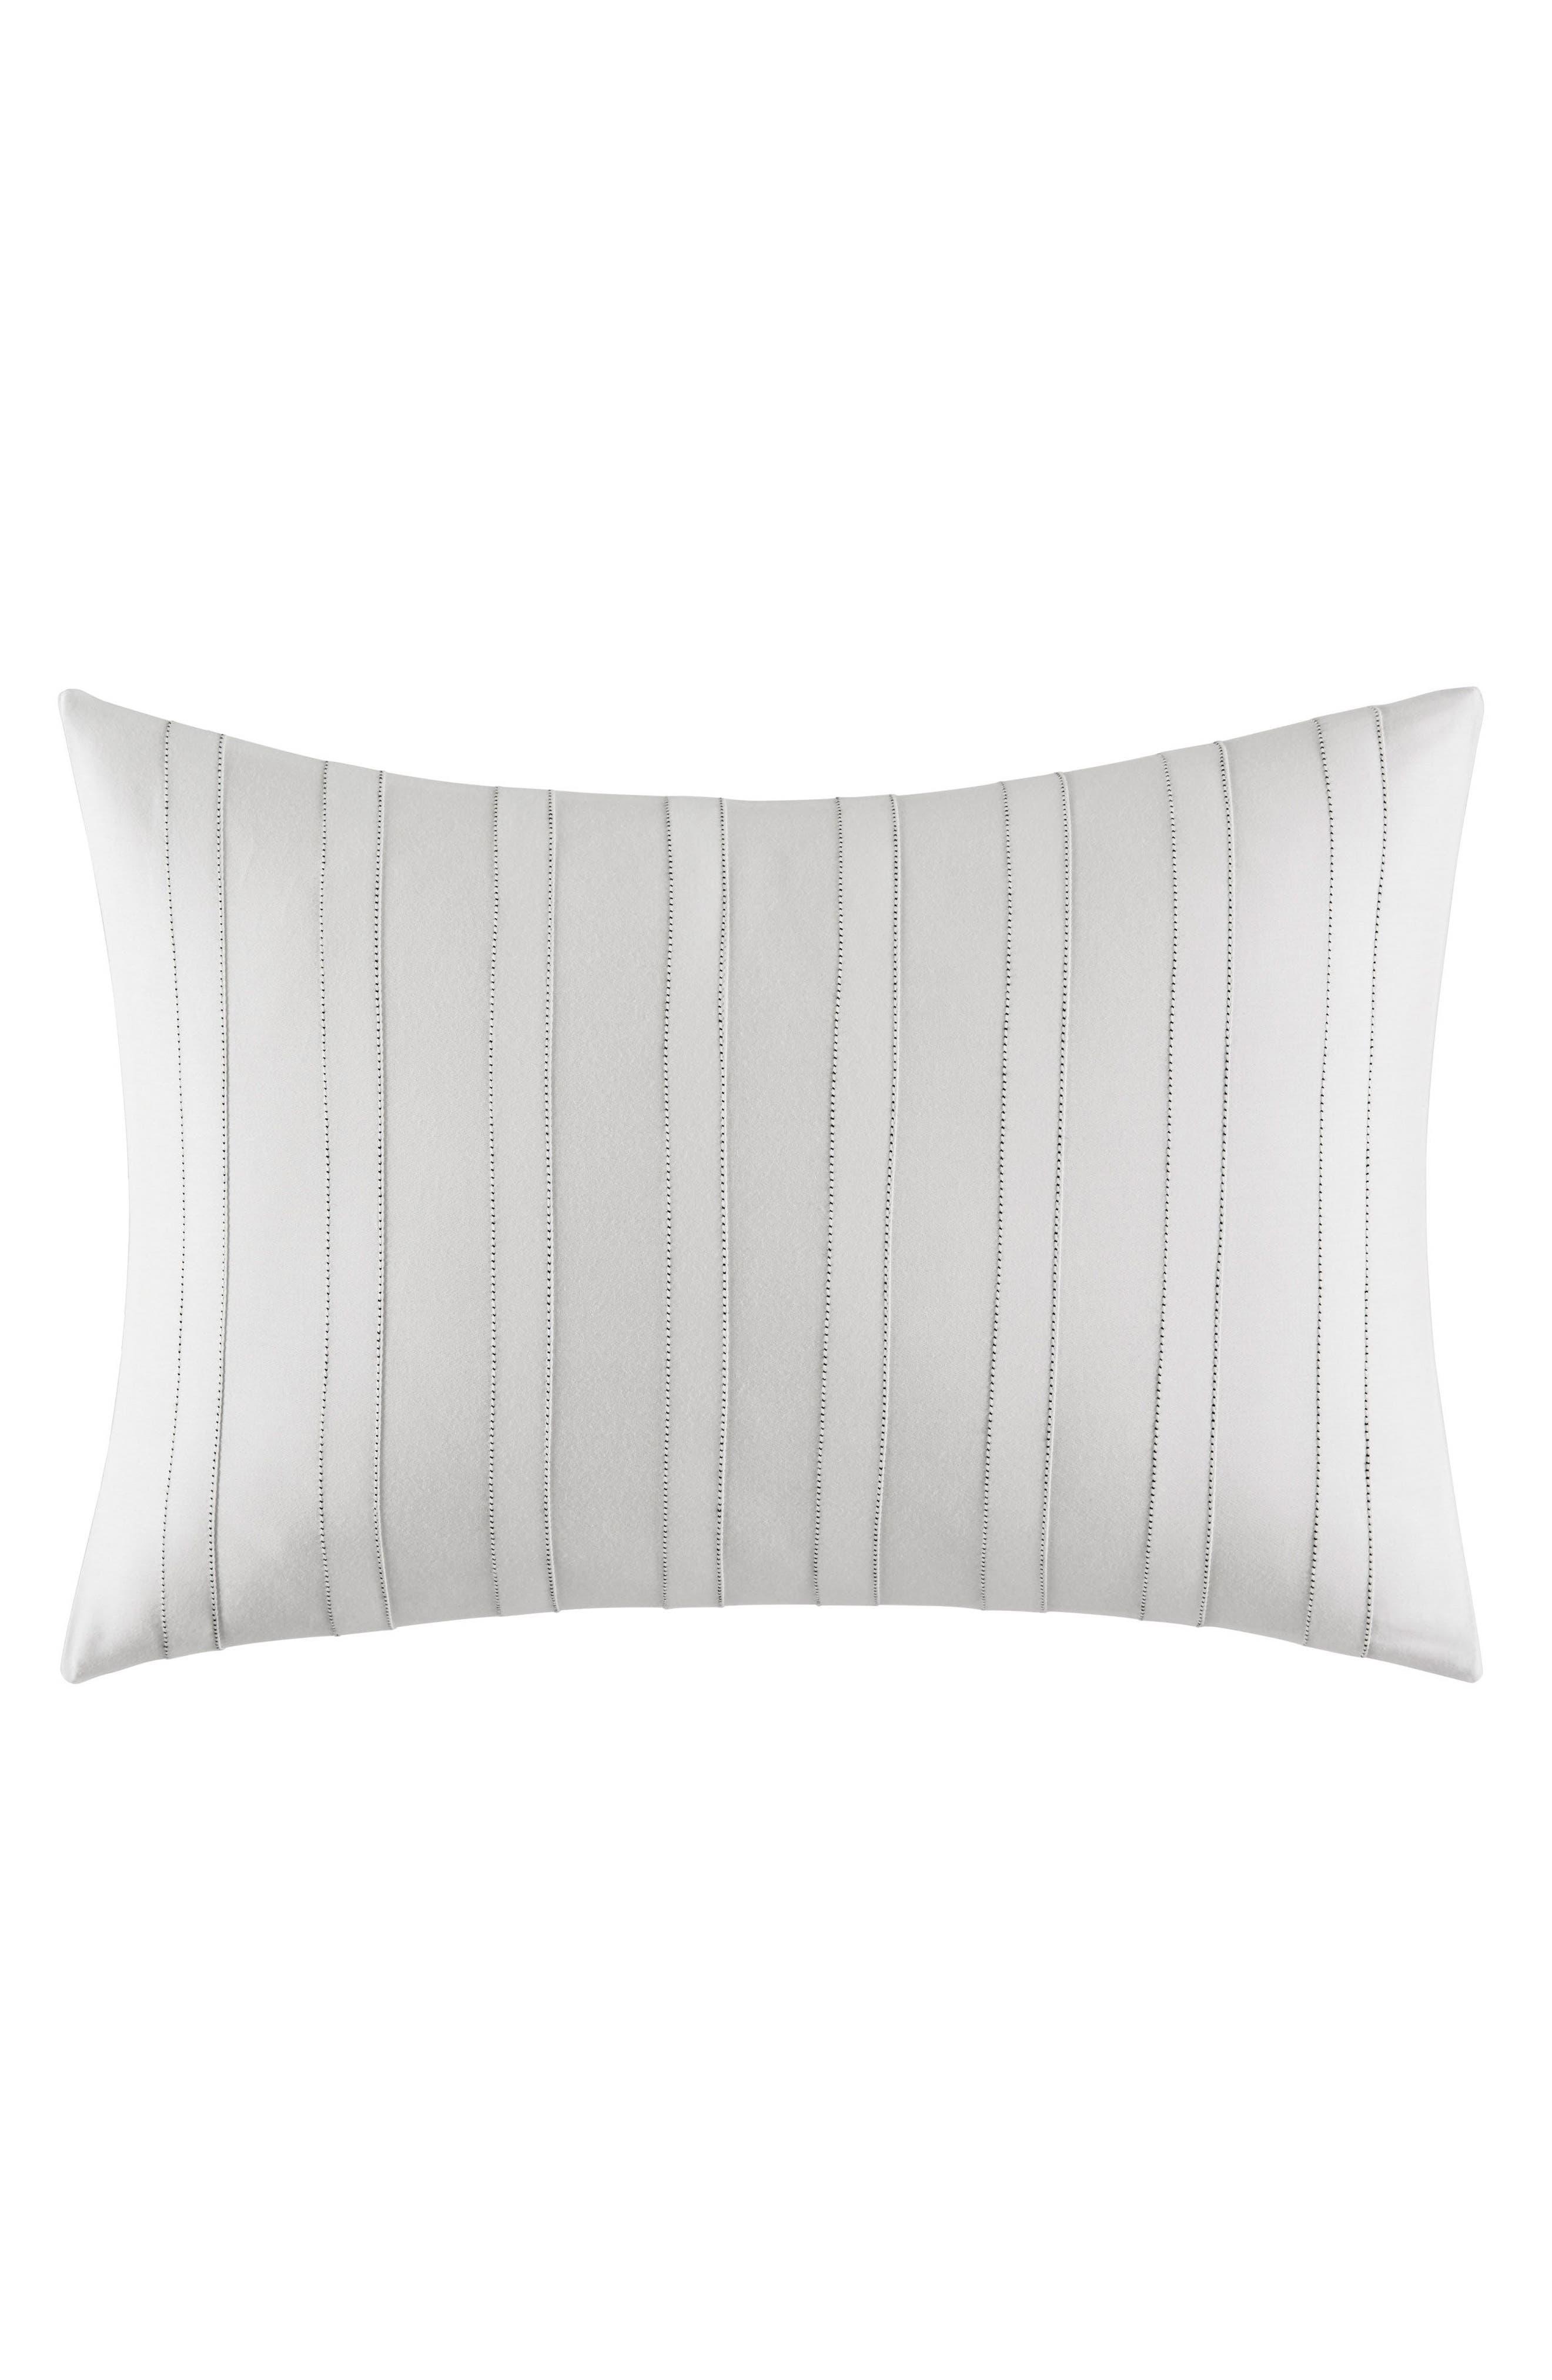 Main Image - Vera Wang Mirrored Square Breakfast Accent Pillow